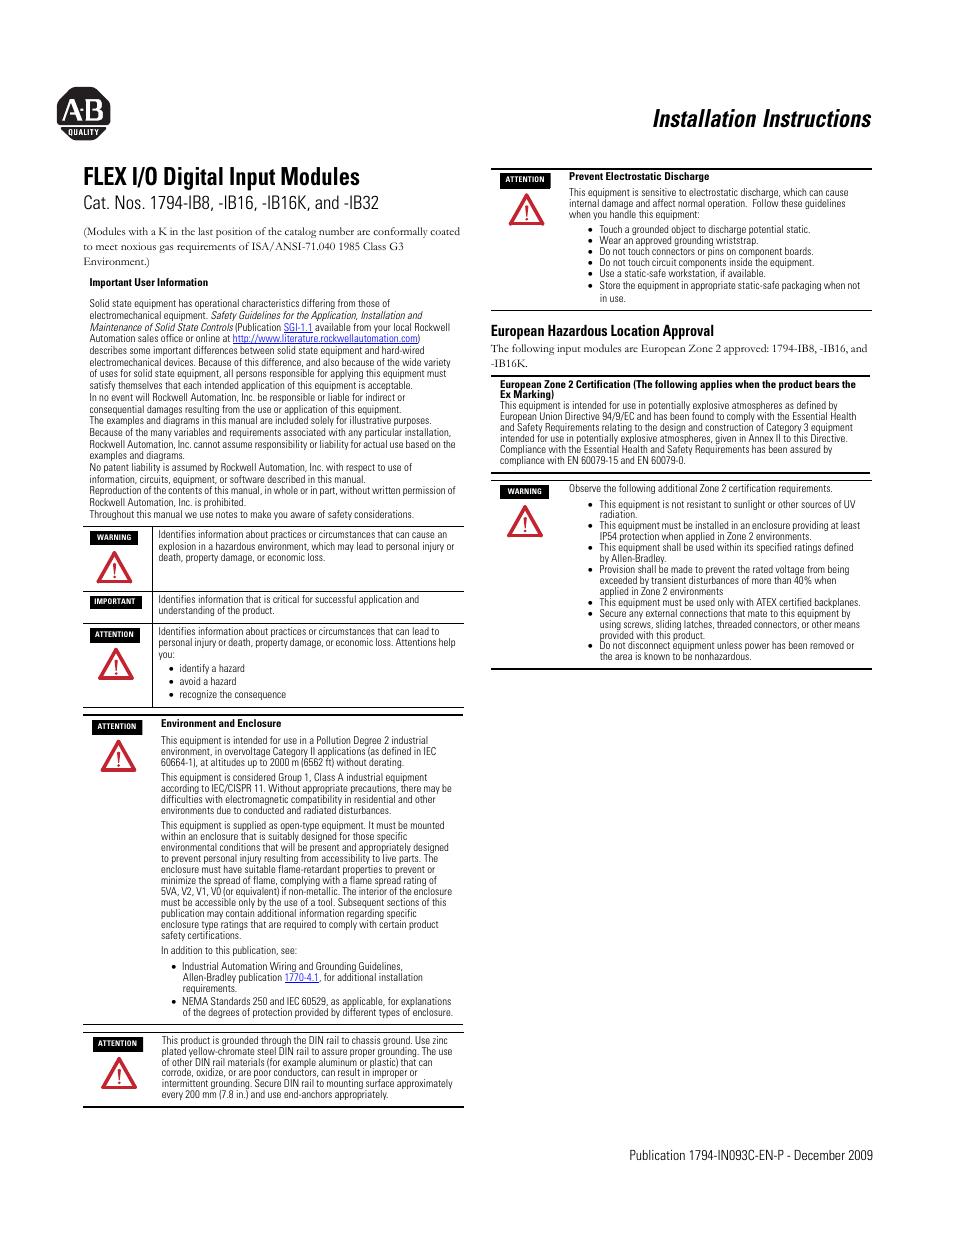 rockwell automation 1794 ib8_ib16_ib16k_ib32 flex i o digital input TB Woods Wiring Diagrams rockwell automation 1794 ib8_ib16_ib16k_ib32 flex i o digital input modules installation instructions user manual 6 pages